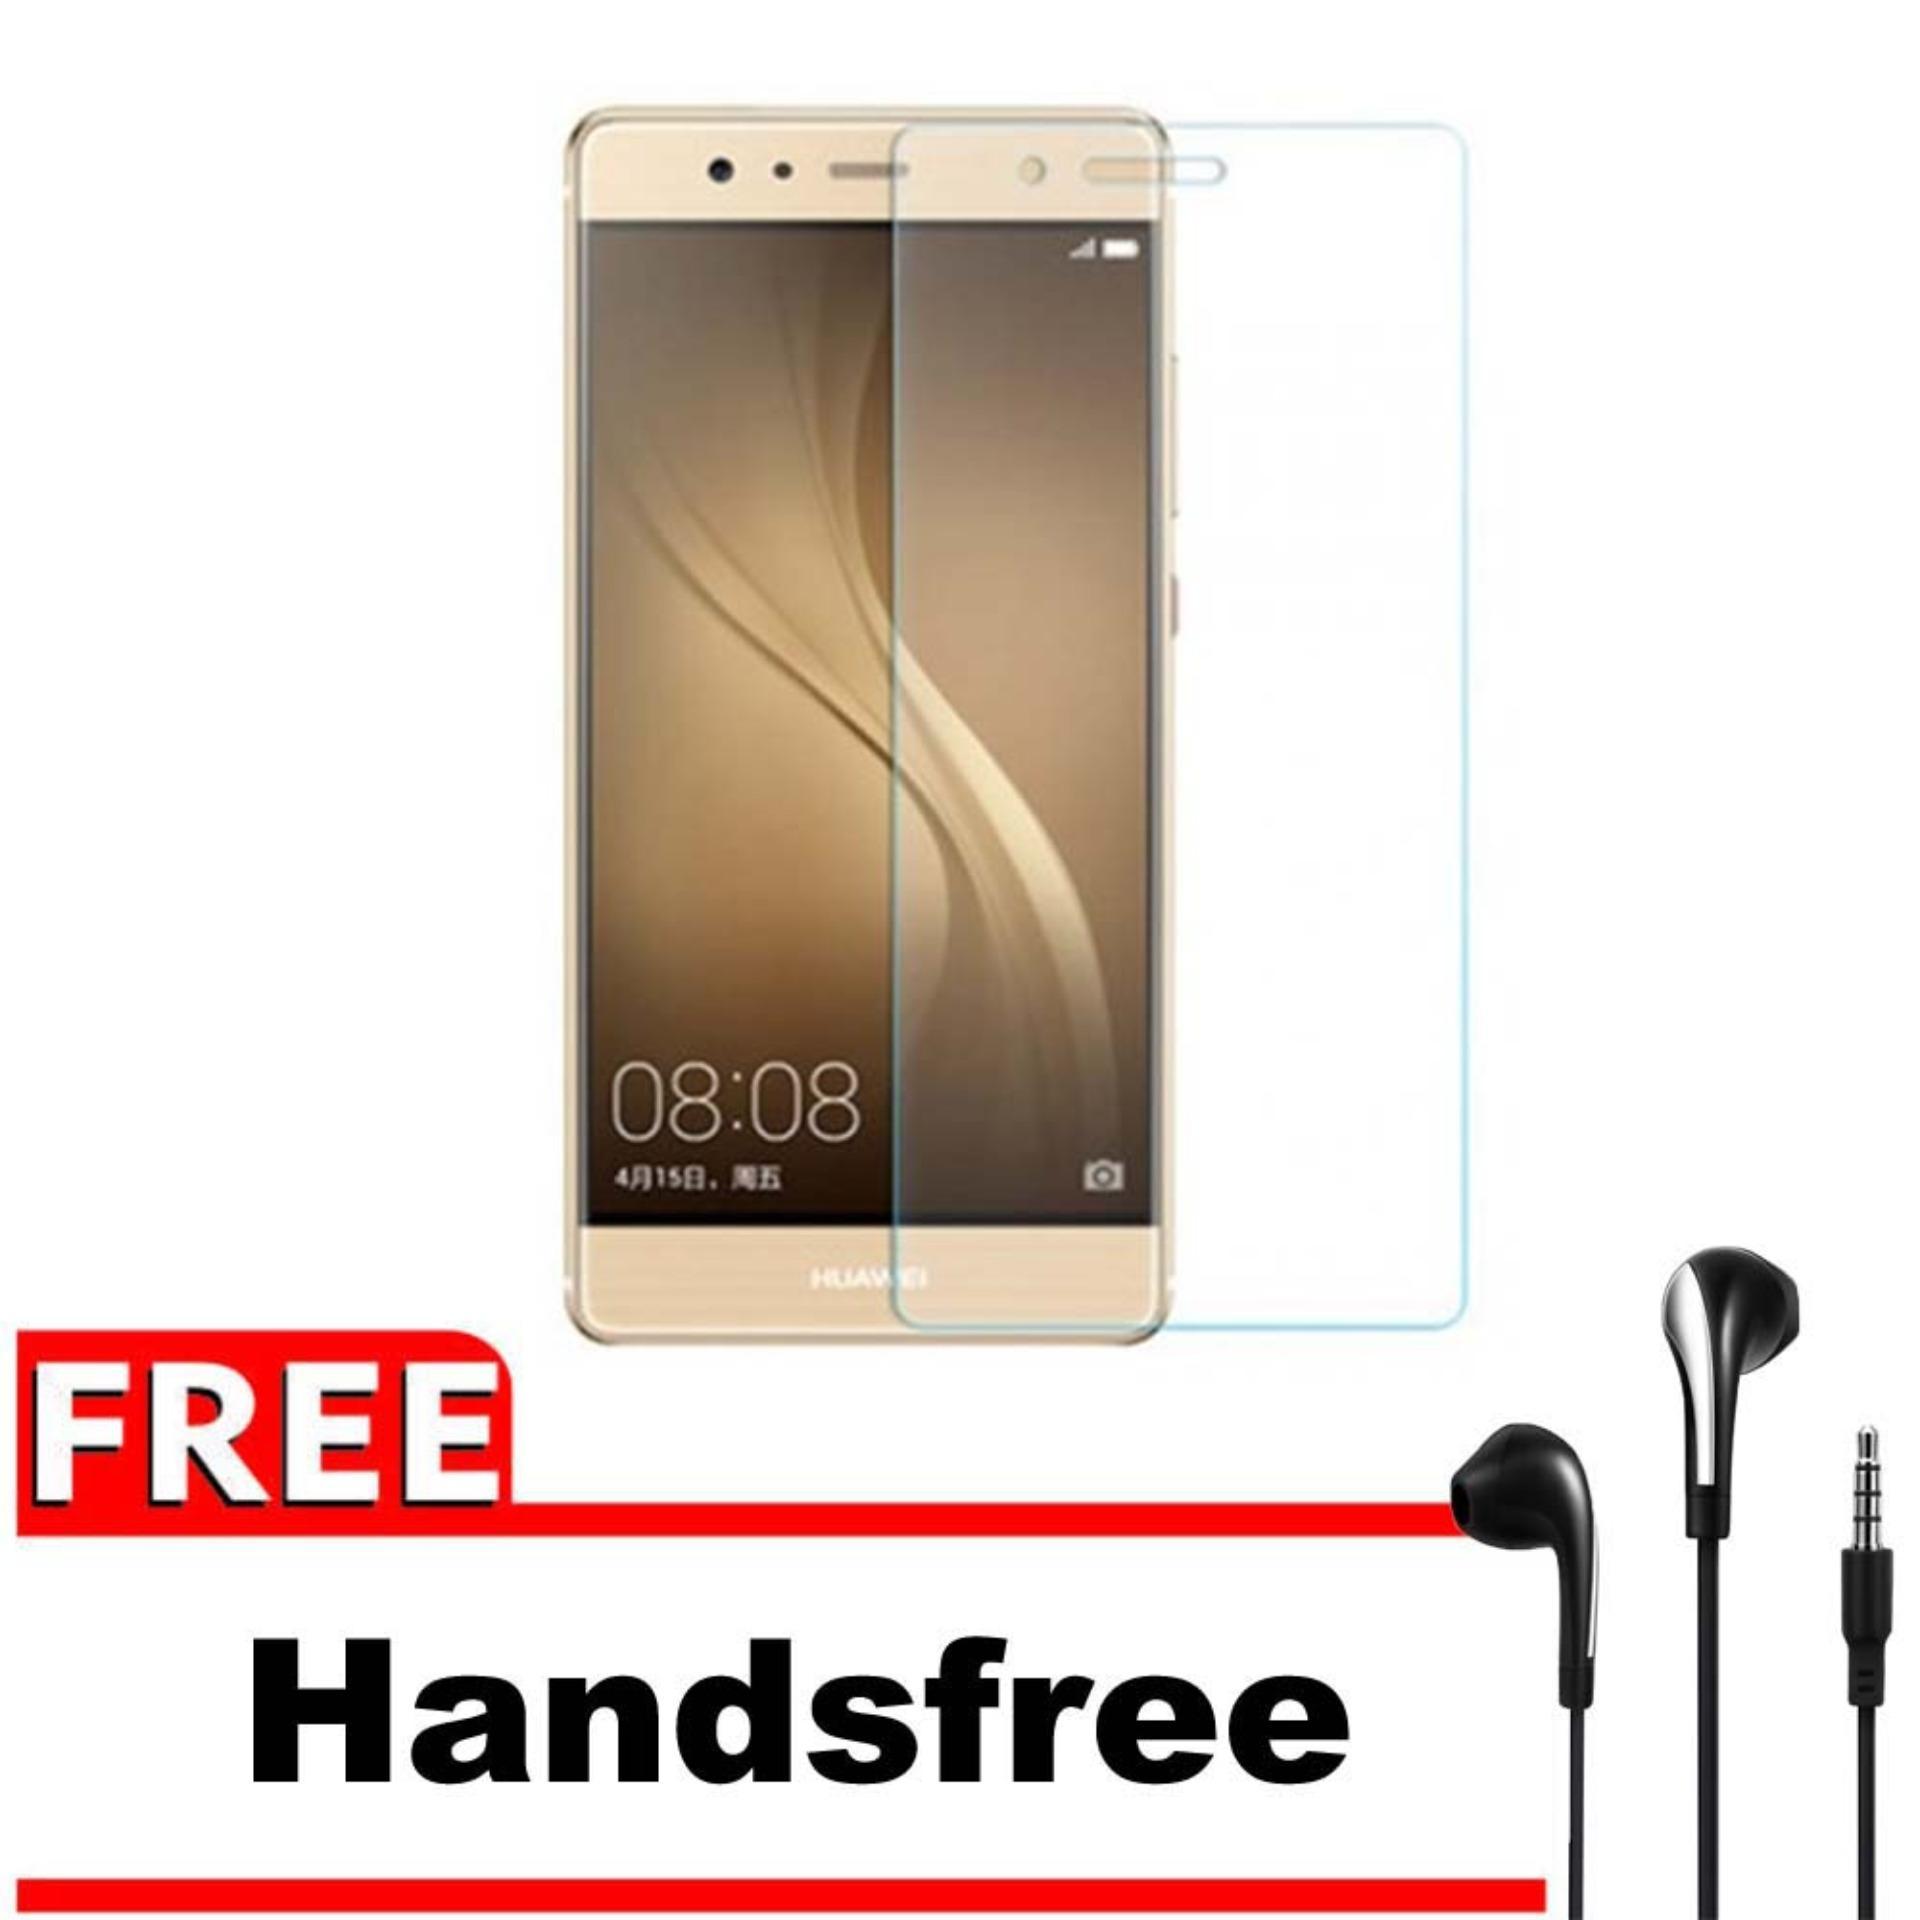 Vn Huawei Ascend Mate 8 Tempered Glass 9H Screen Protector 0.32mm + Gratis Free Handsfree Earphone Headset Universal - Bening Transparan